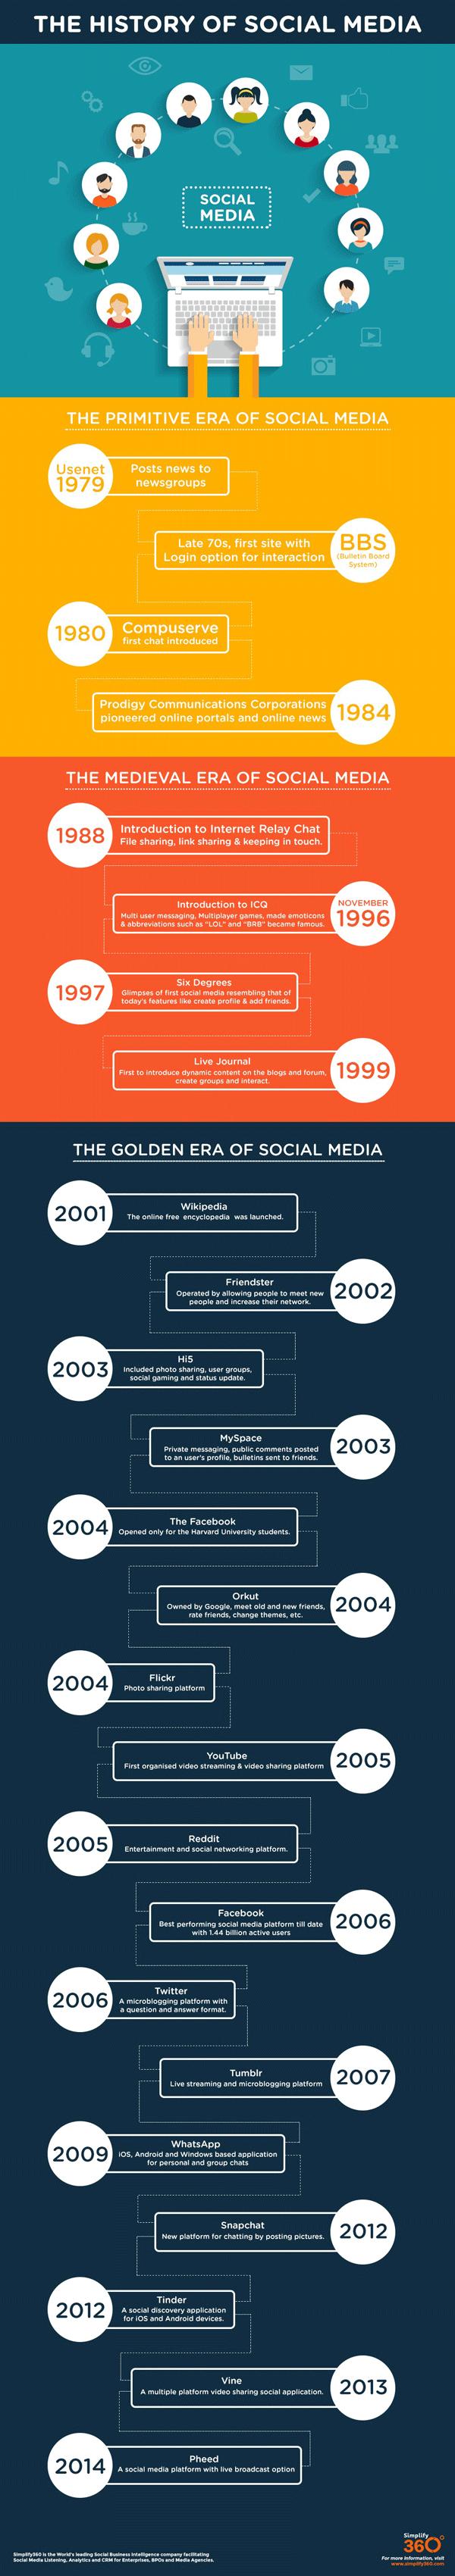 les 3  u00e9tapes de l u0026 39 histoire des r u00e9seaux sociaux en infographie